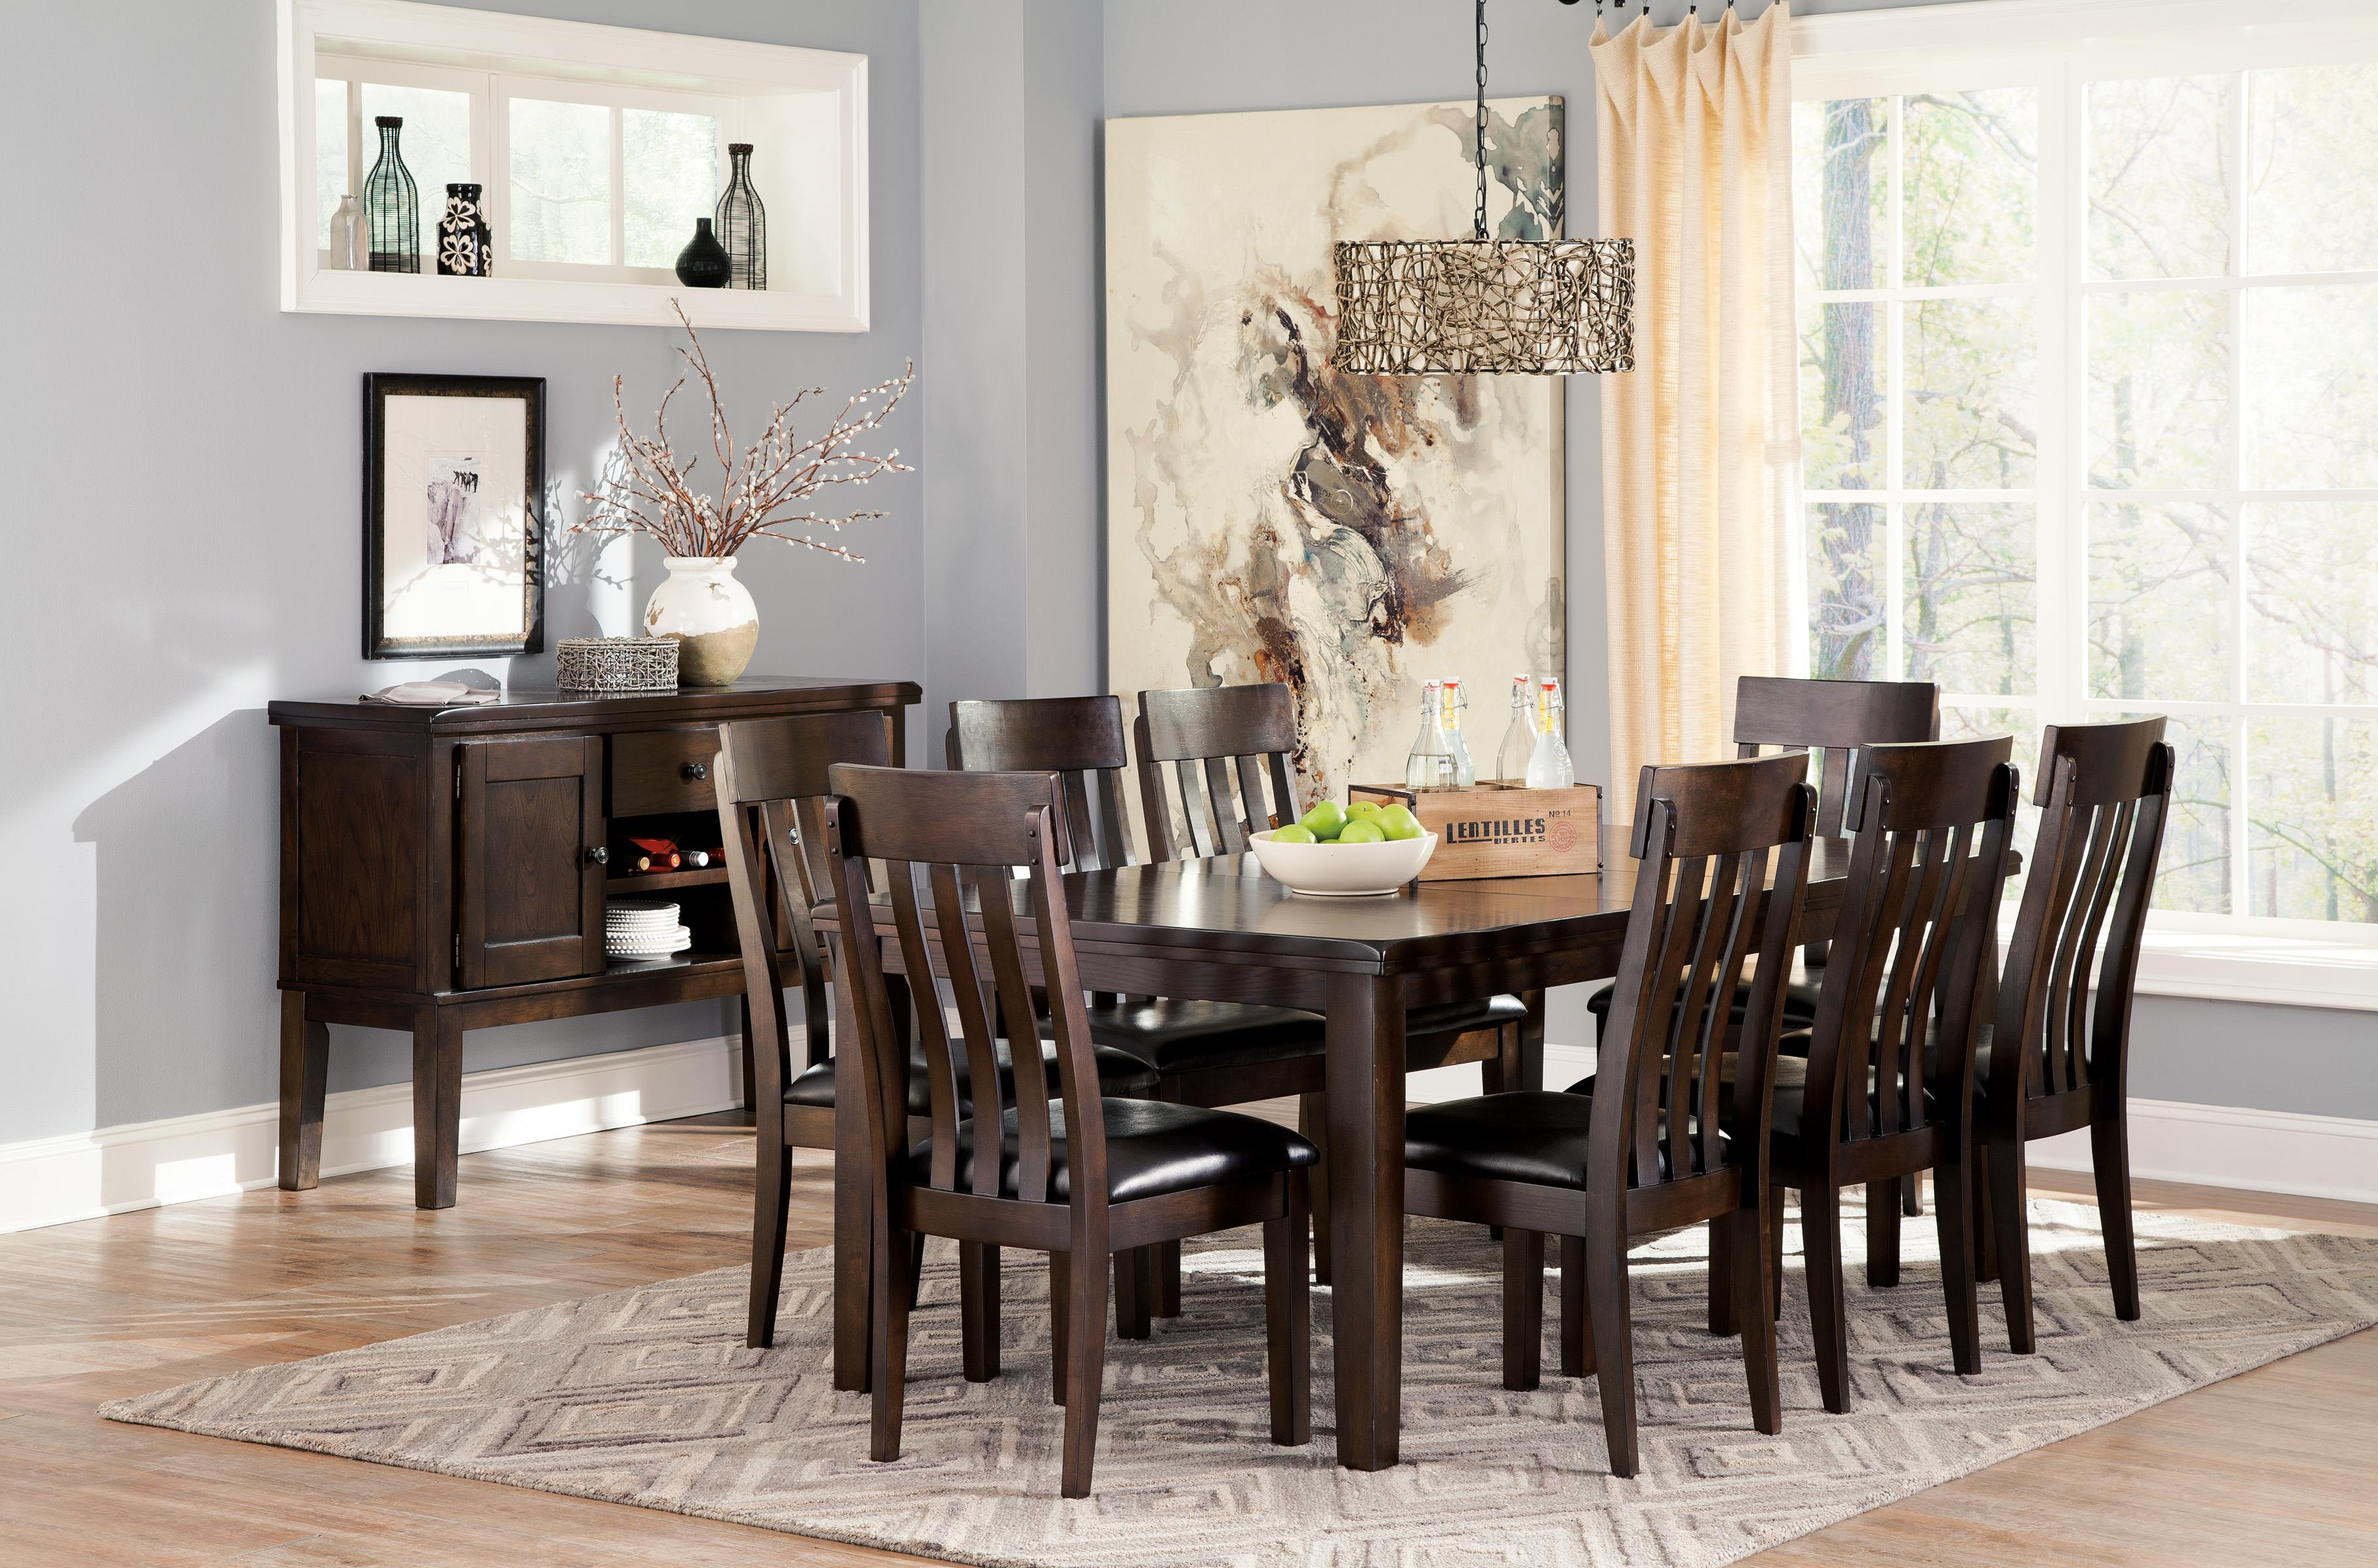 9 piece rectangular dining room table w oak veneers and for Dining room tables 9 piece